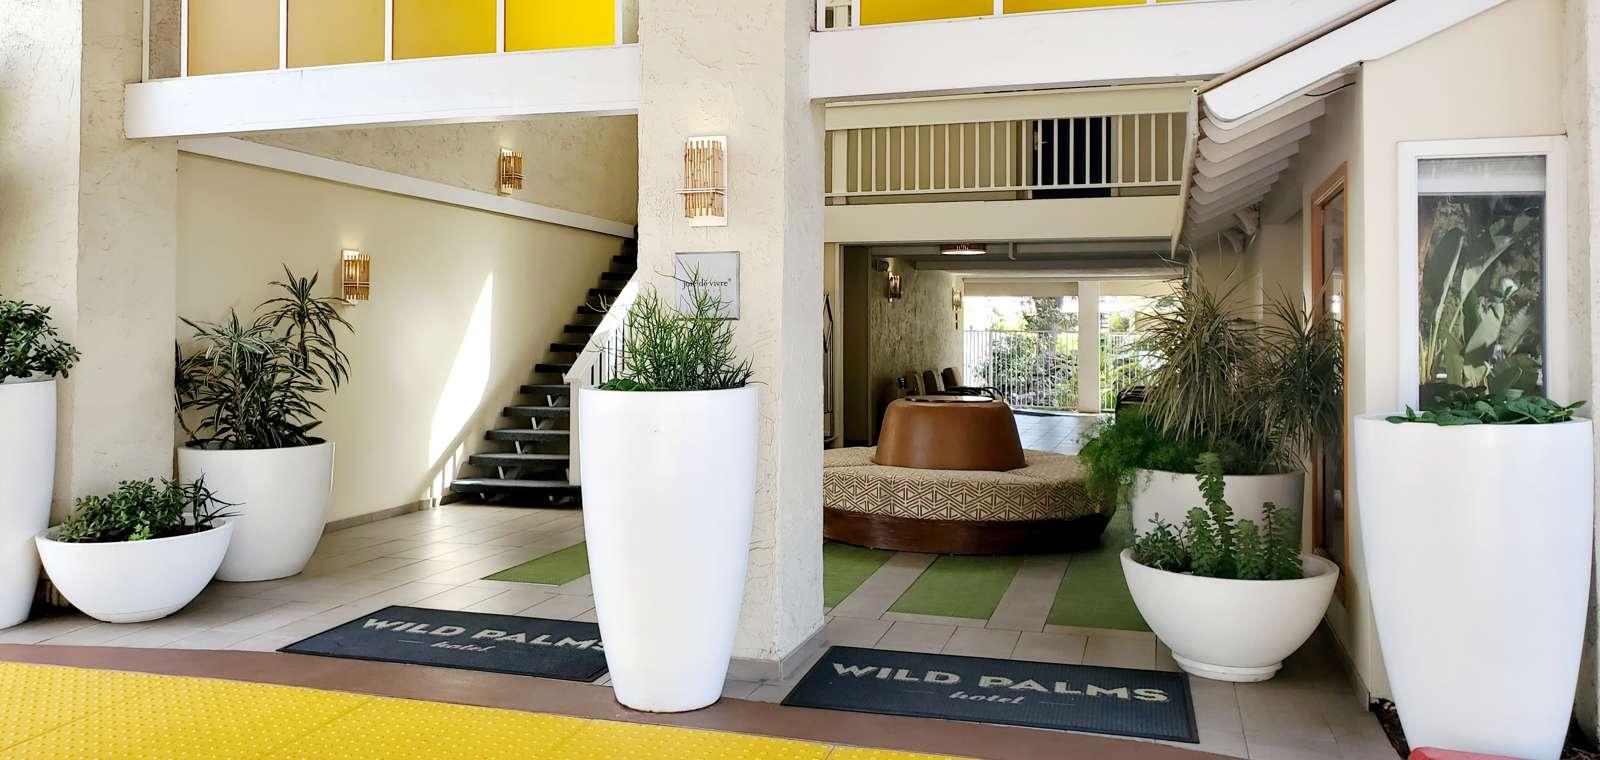 Lobby exterior